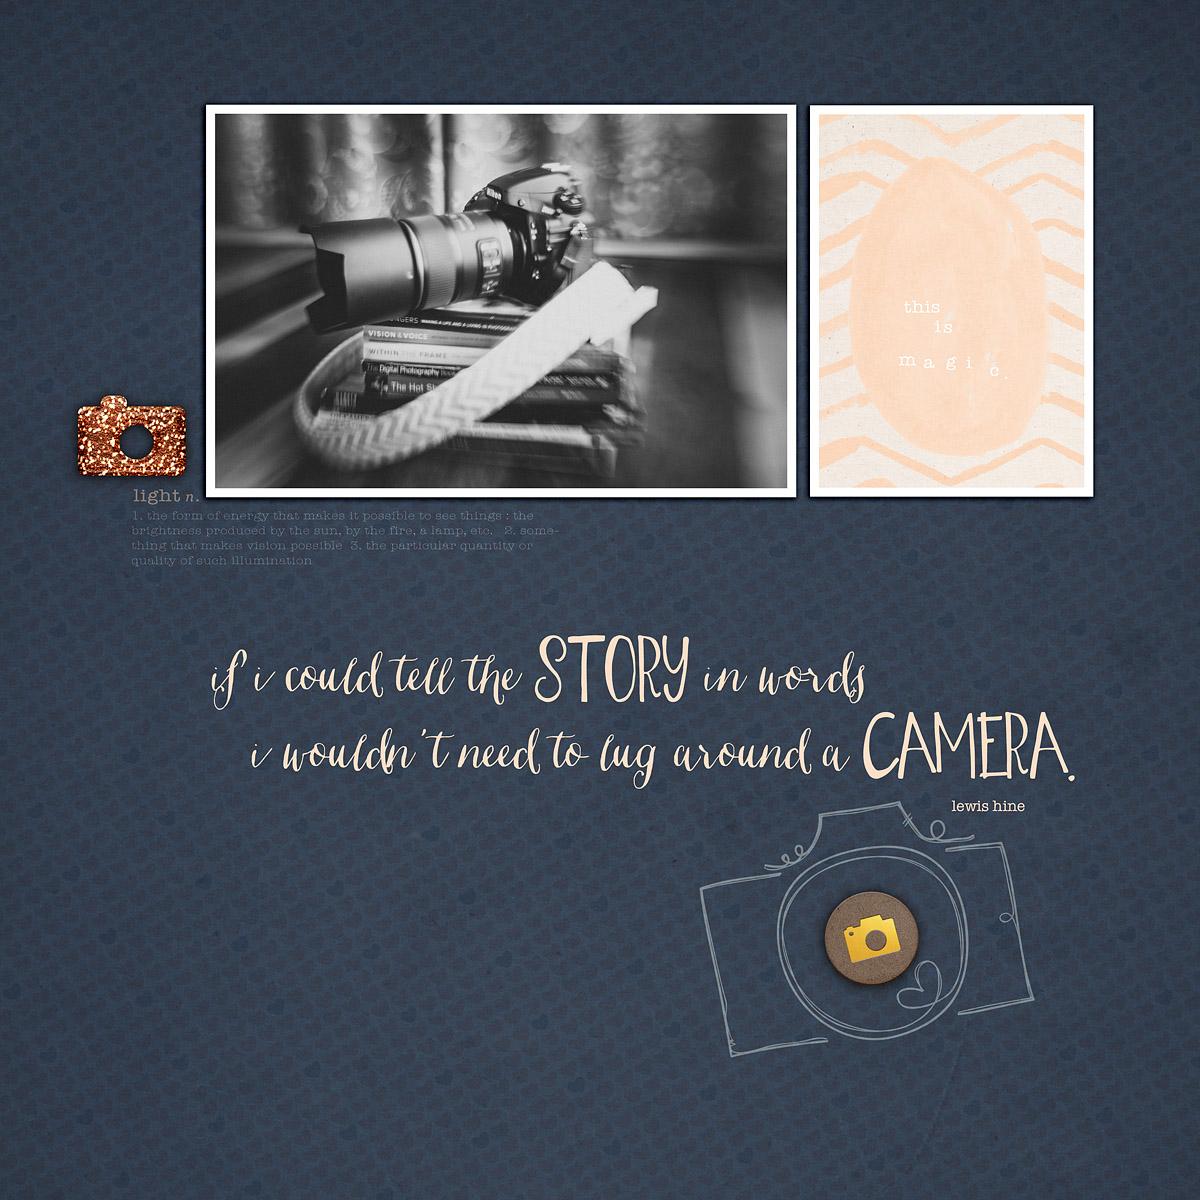 Camera copysm.jpg